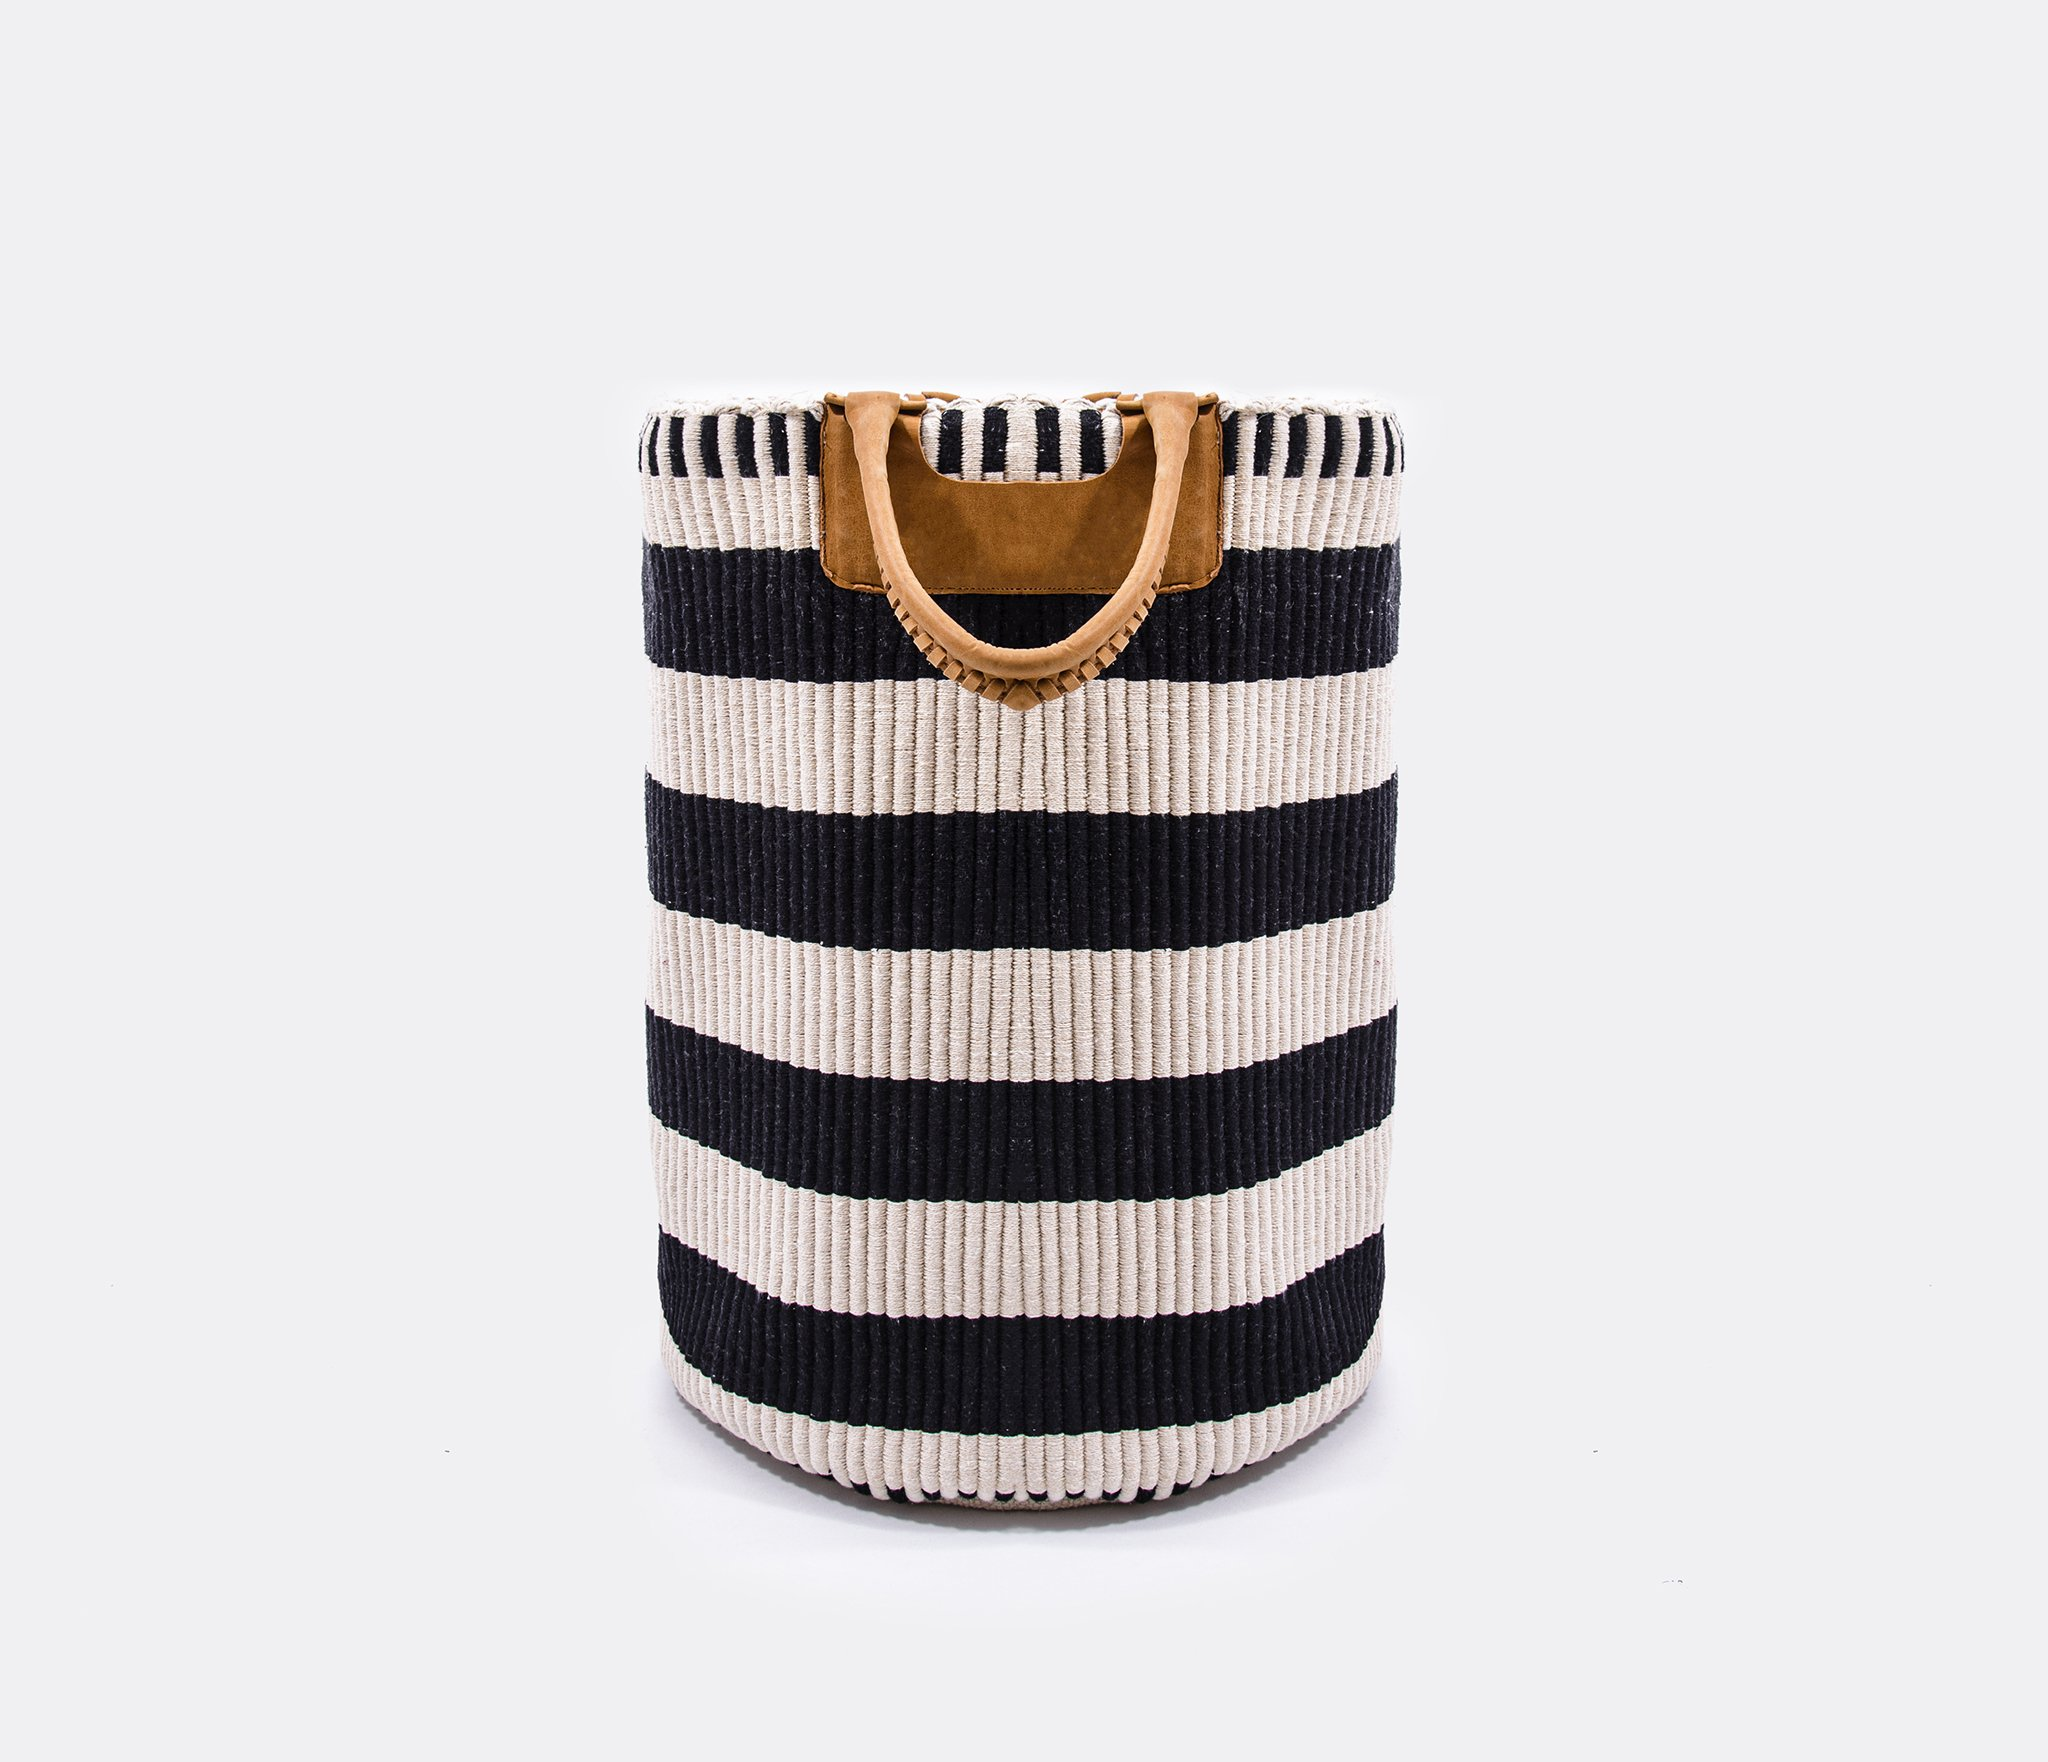 Jasmine Woven Basket